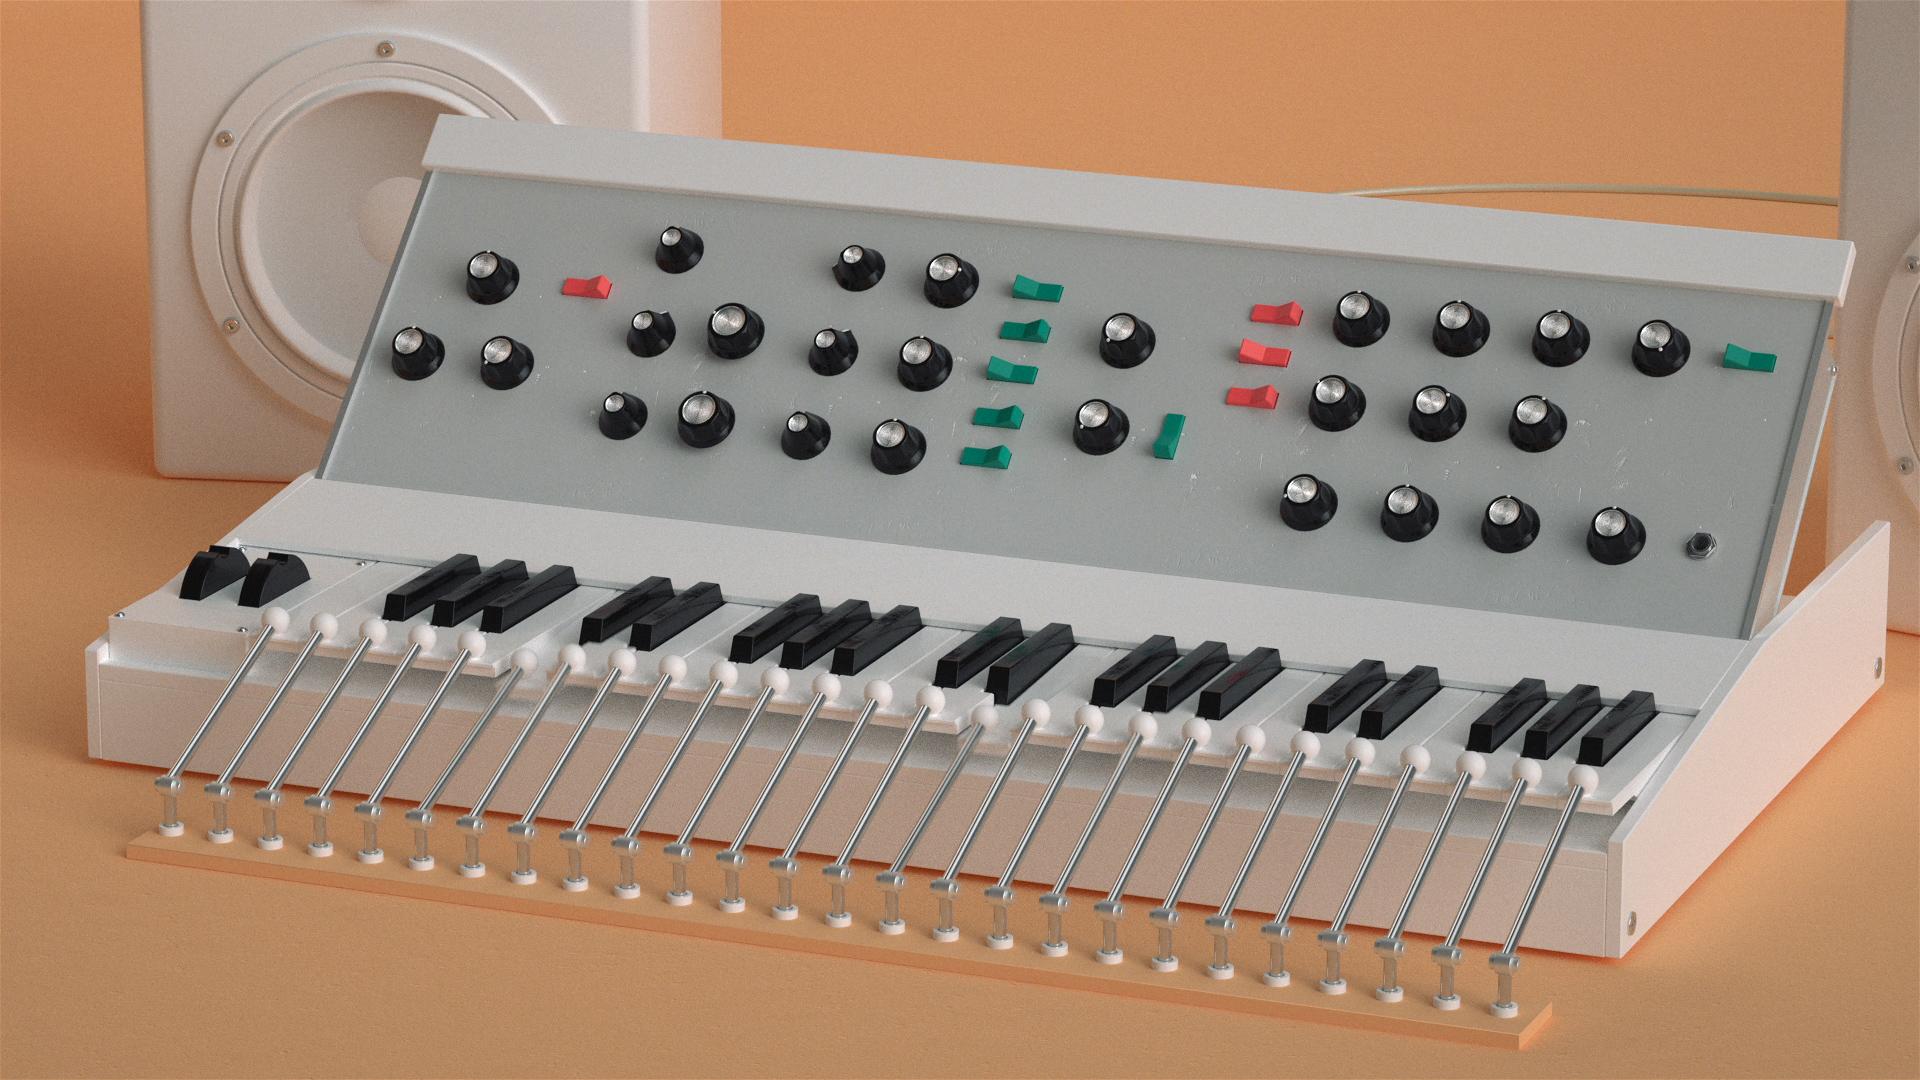 MACHINES-04-MUSIQUE.1214.Image fixe017